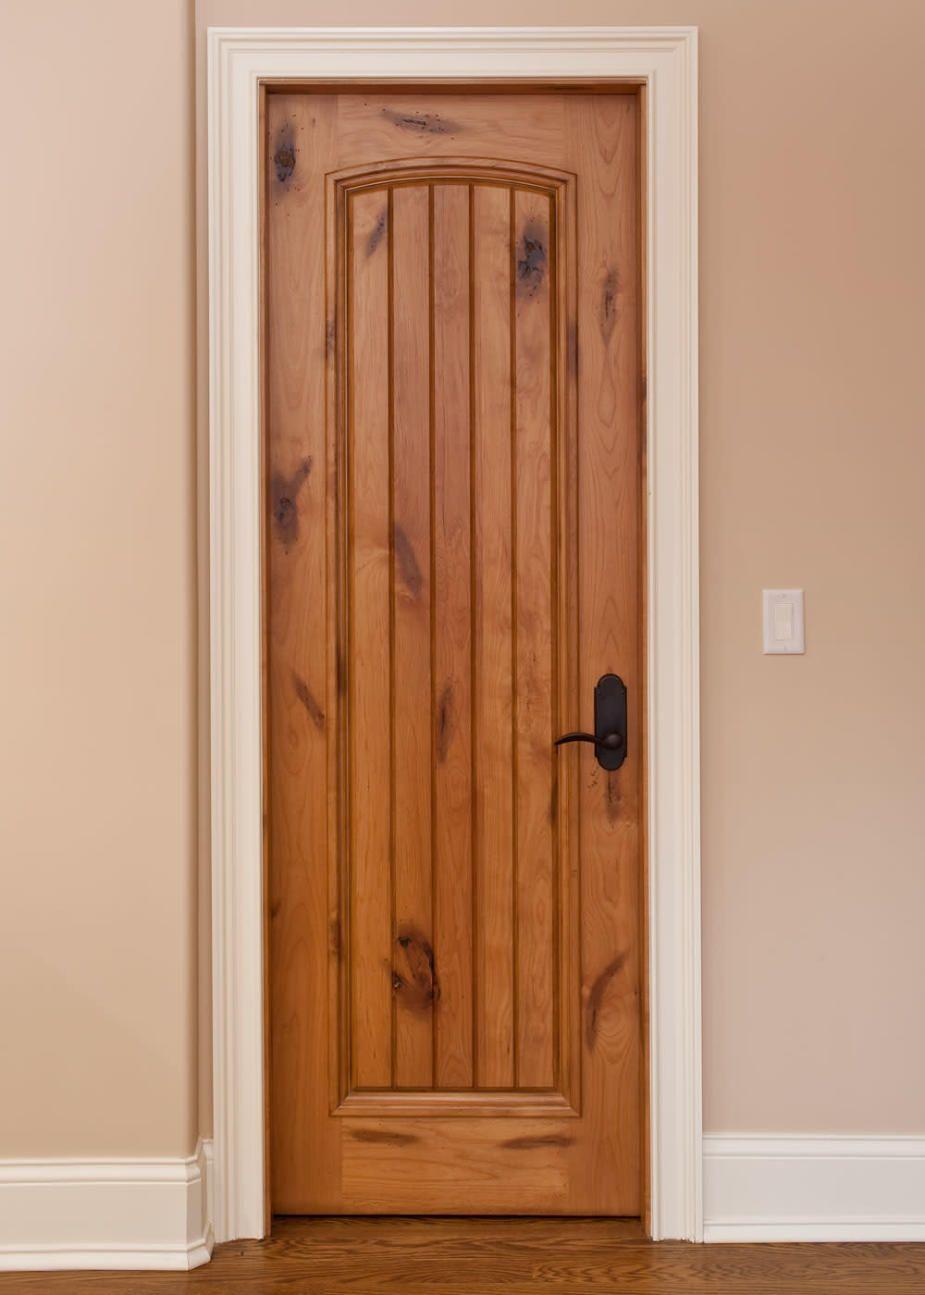 Choosing Interior Doors for Sustainable Households